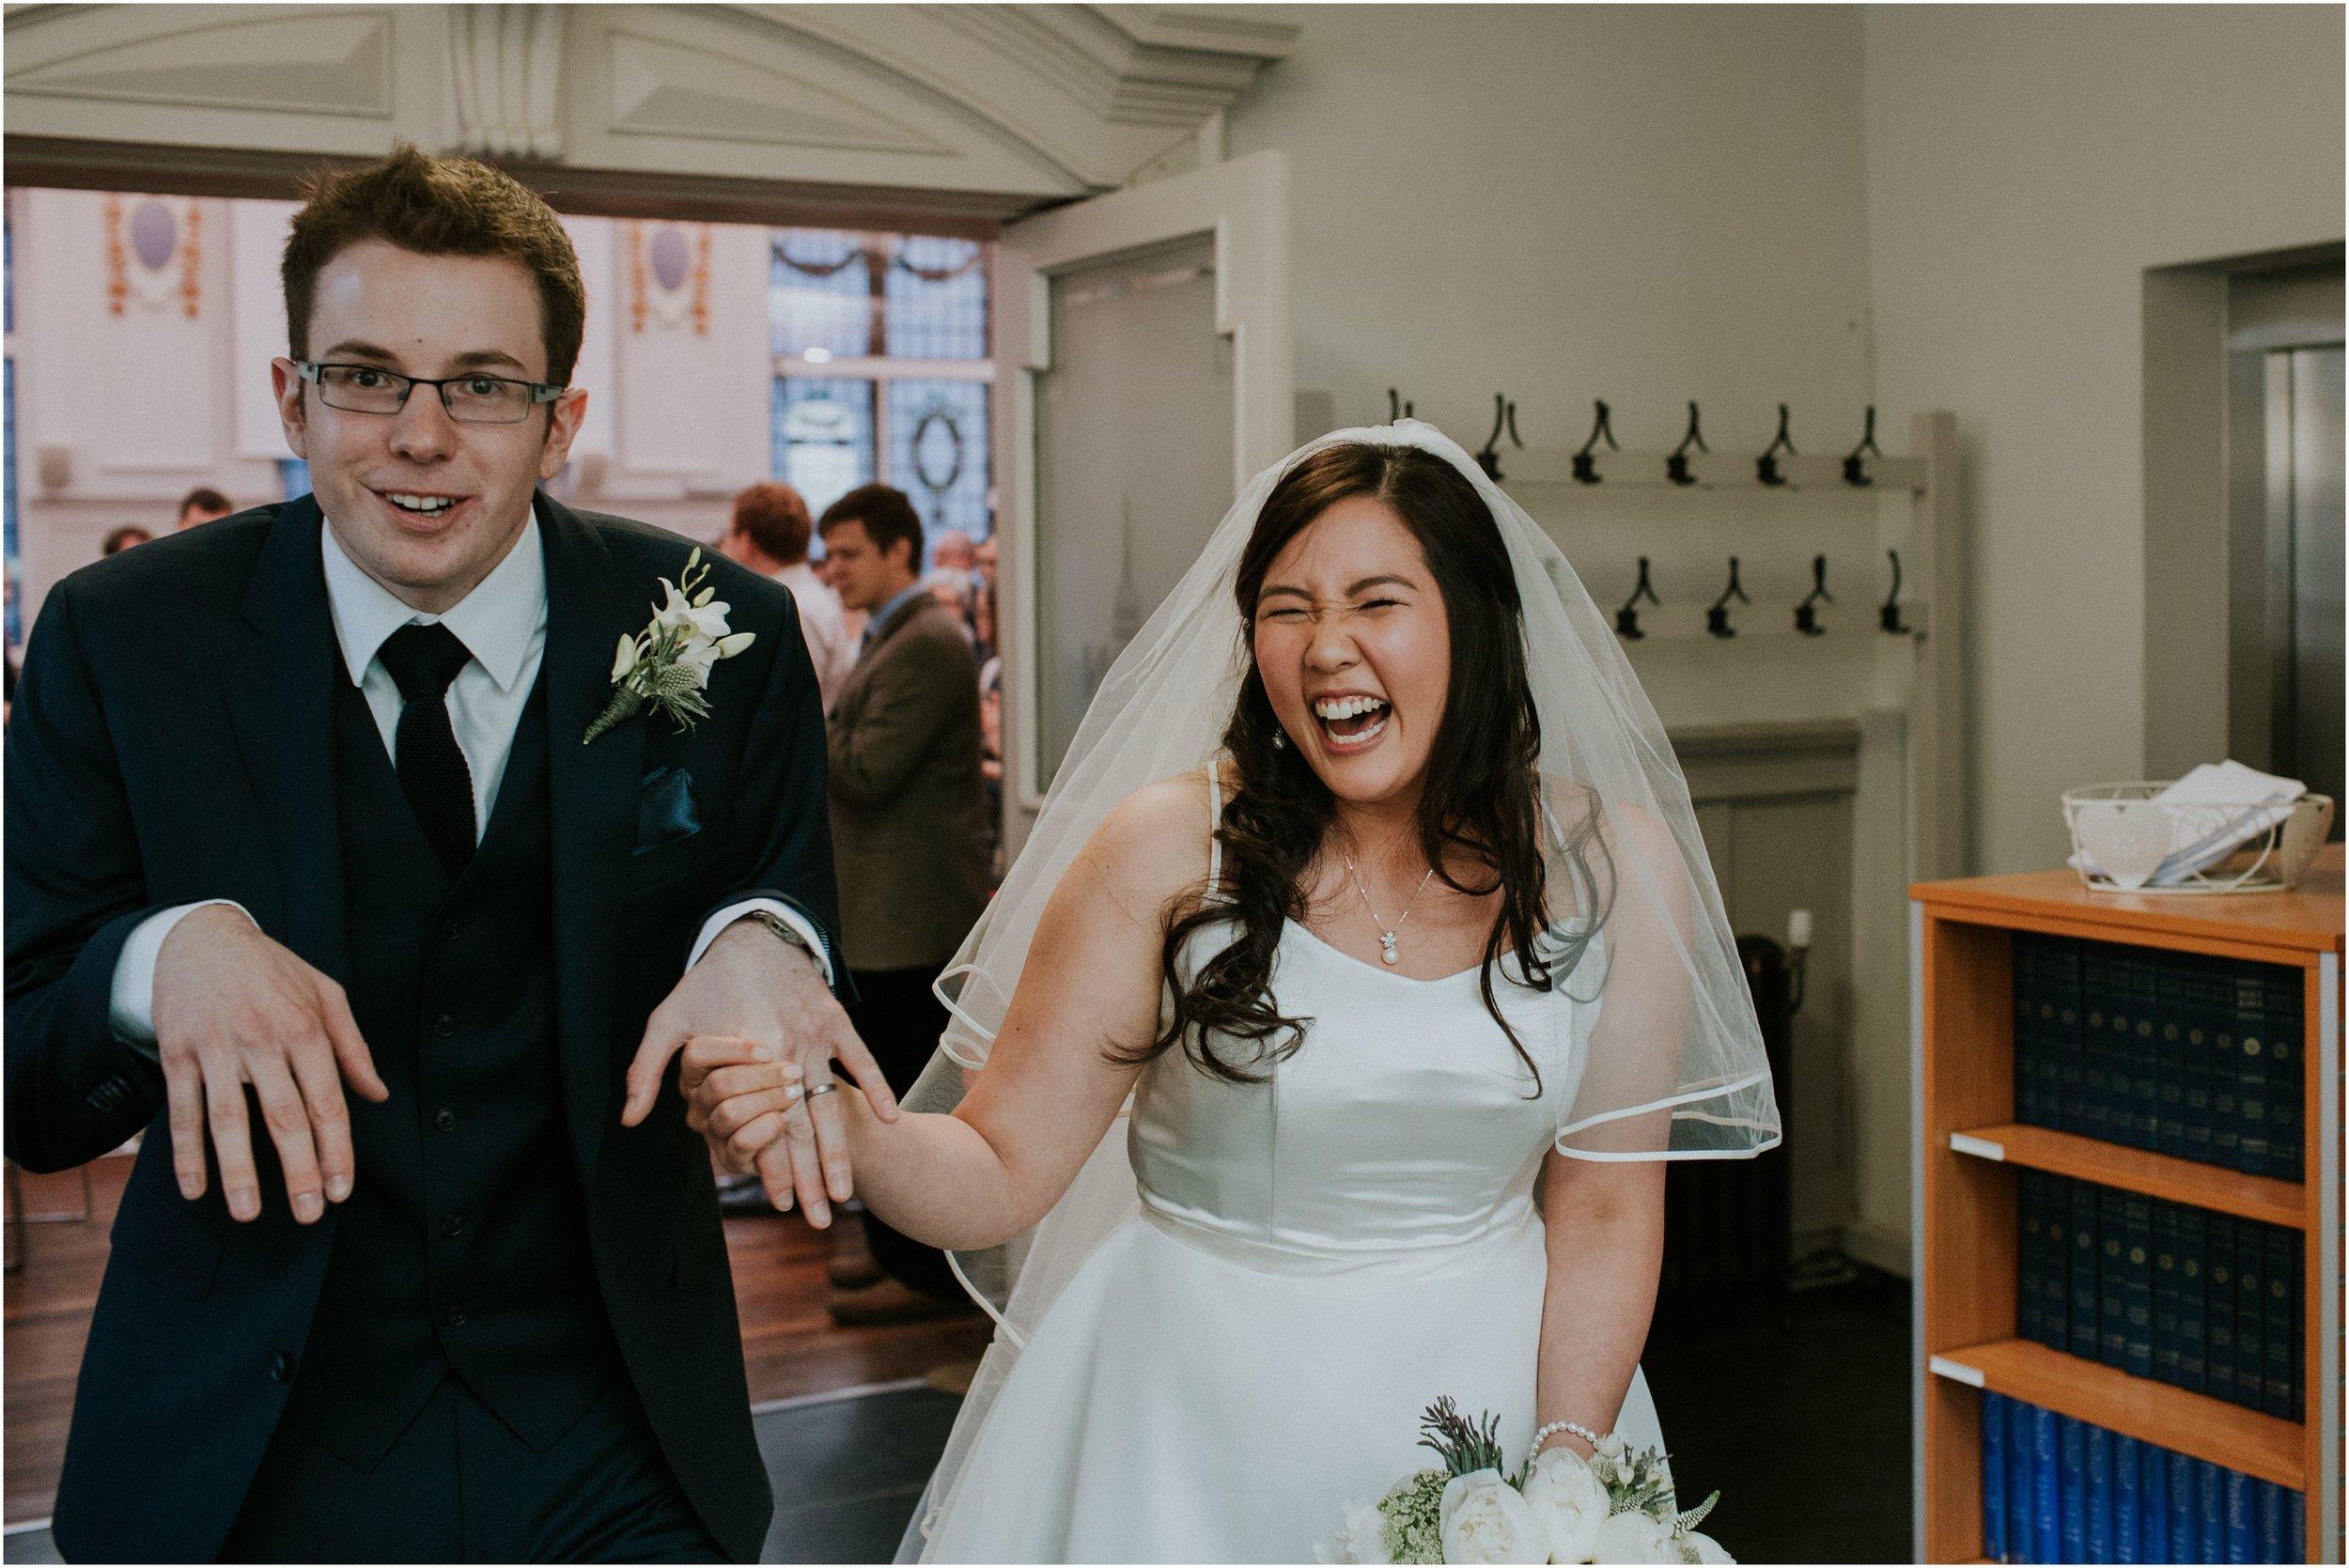 Photography 78 - Glasgow Wedding Photographer - Year in Reveiw_0096.jpg